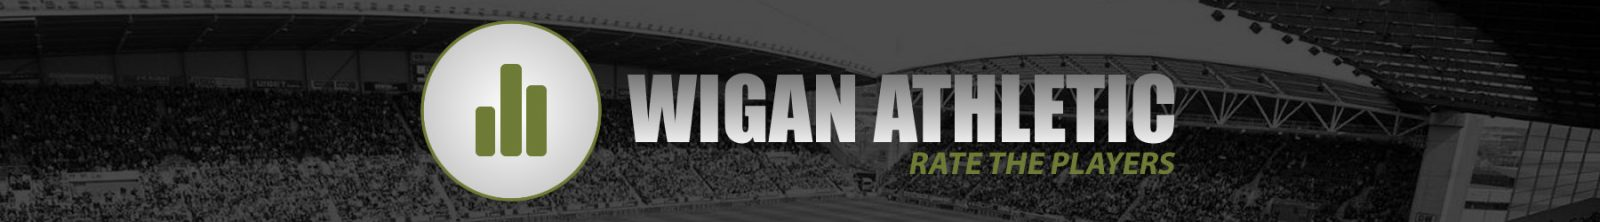 Rate Wigan Athletic